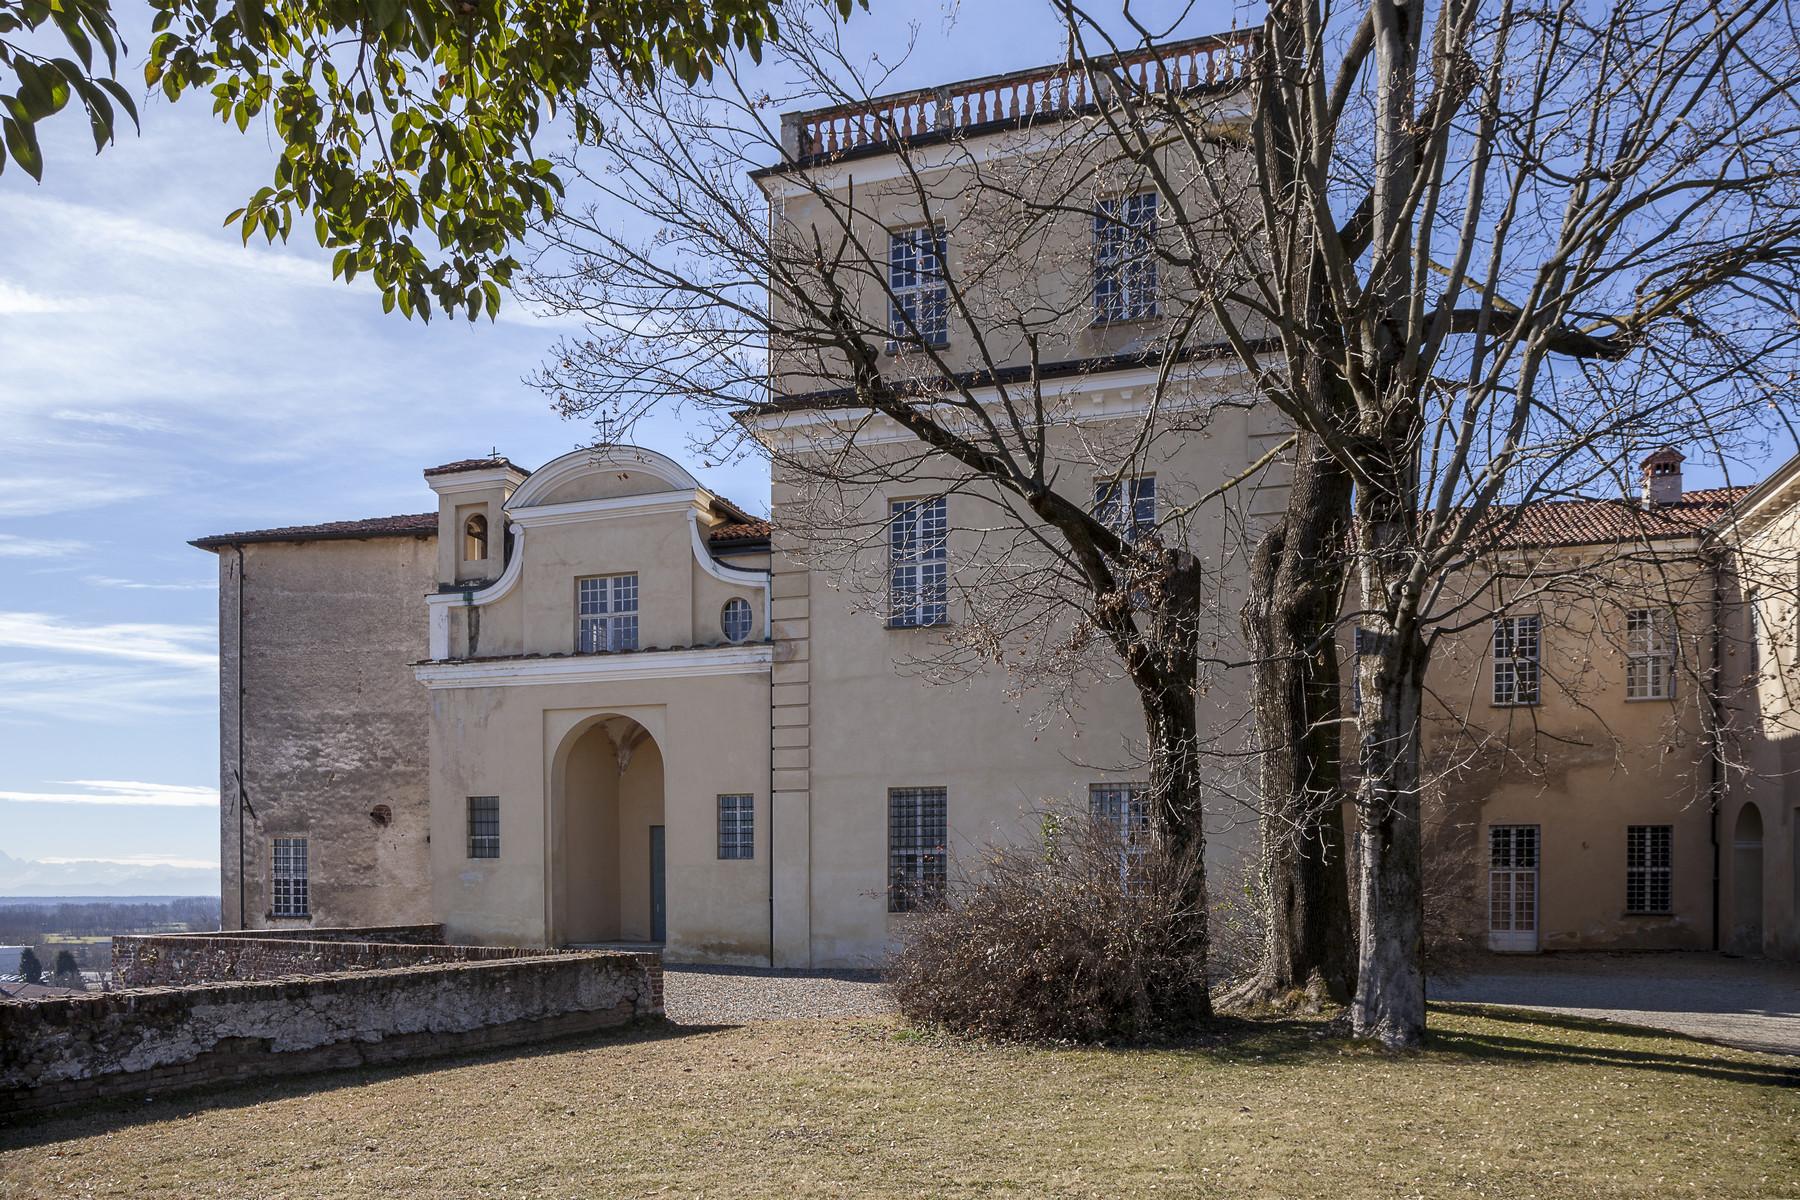 Additional photo for property listing at Majestic medieval castle in San Giorgio Canavese via Piave salita al castello San Giorgio Canavese, Turin 10090 Italien